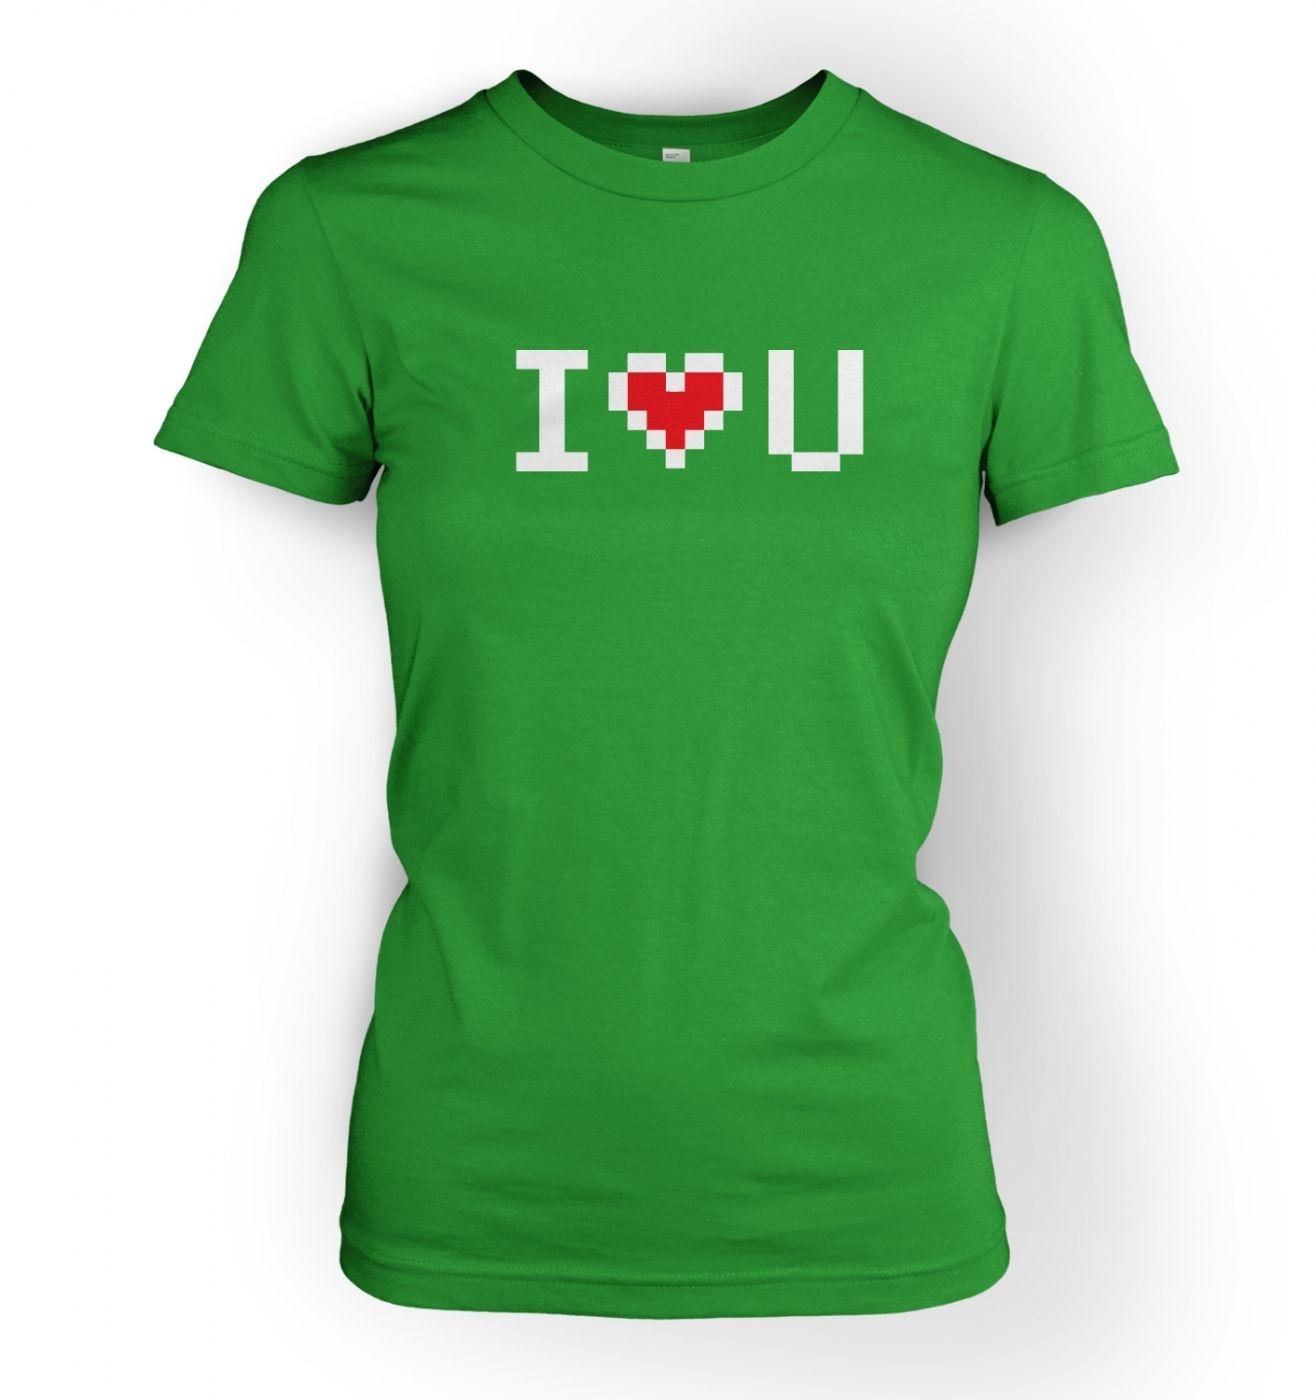 Women's pixelated I heart u t-shirt